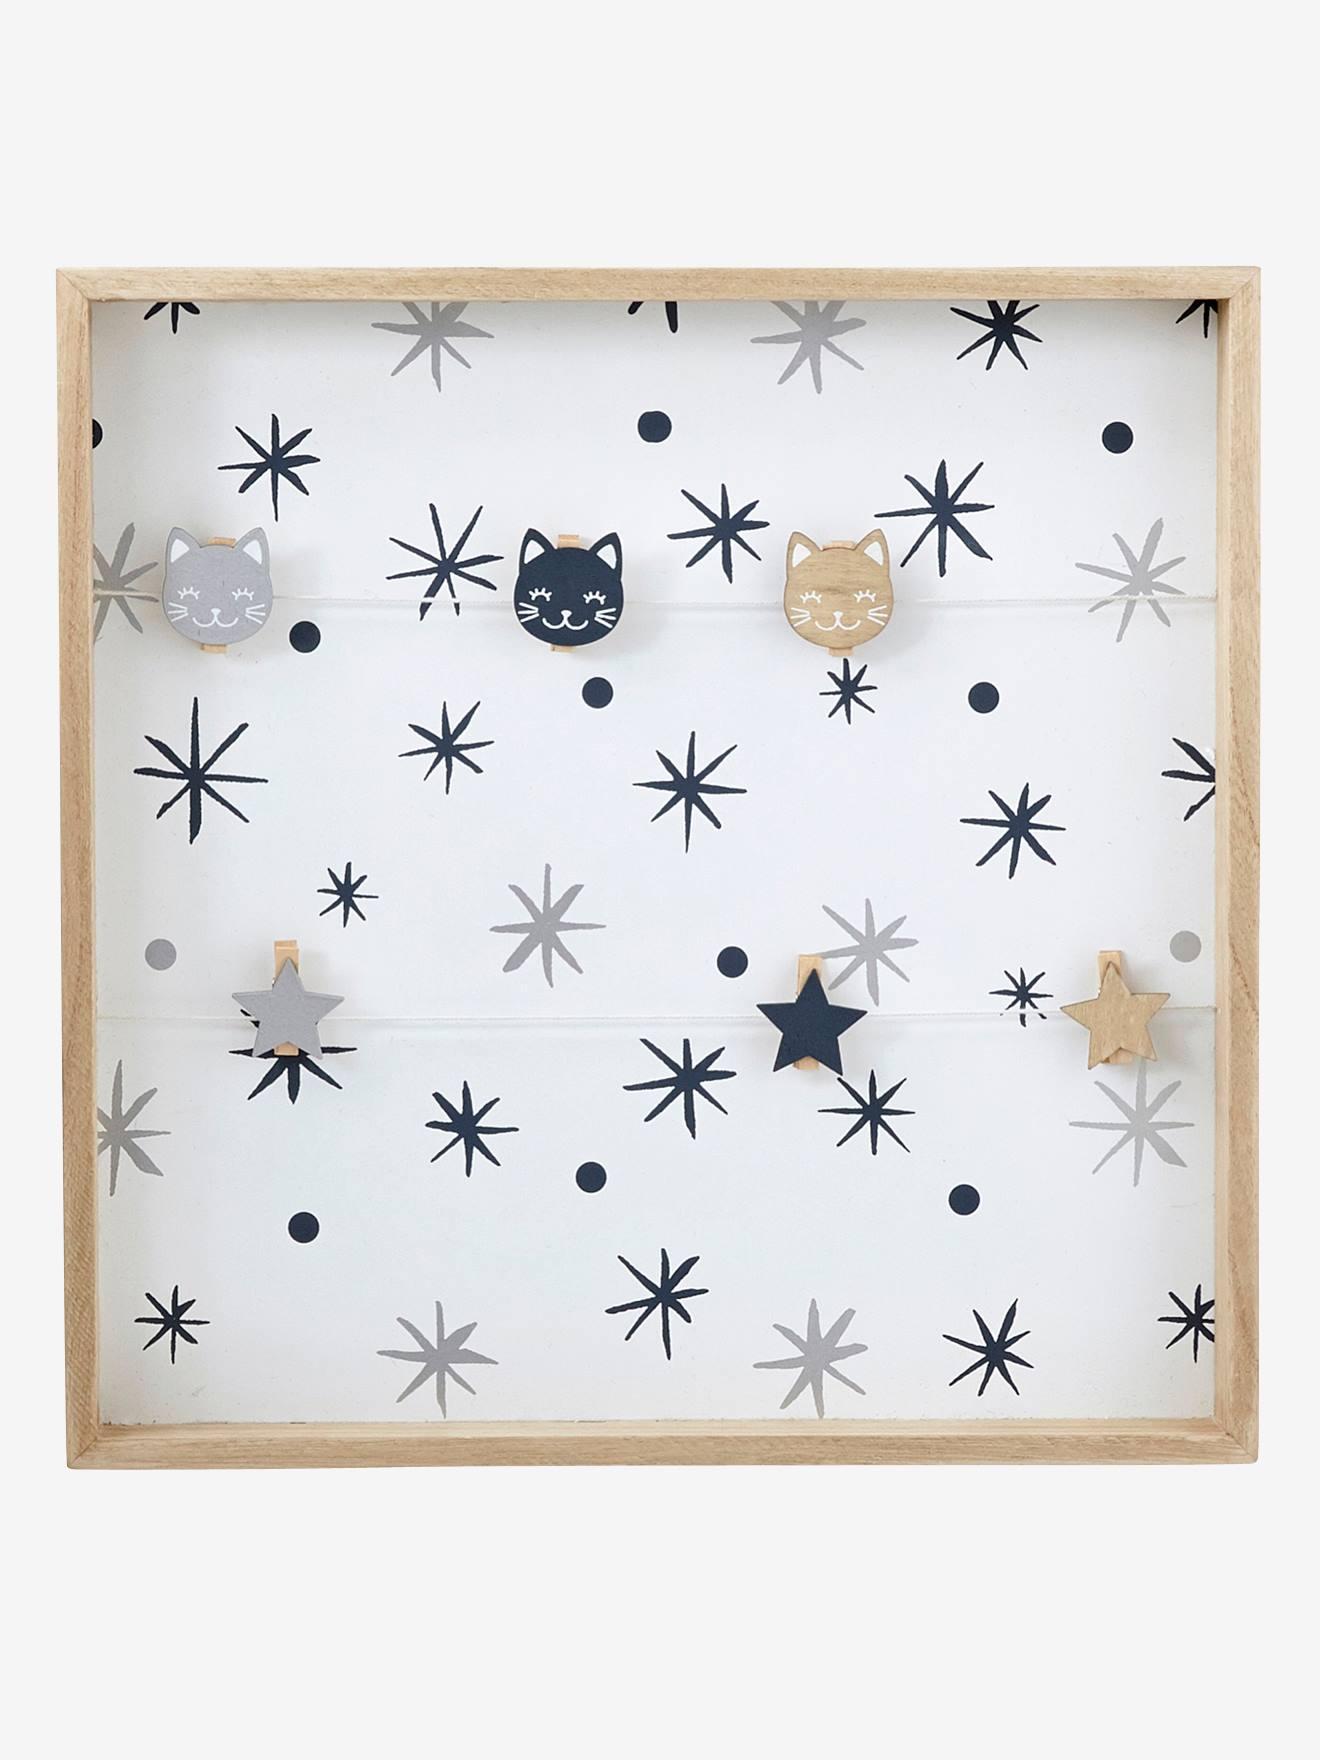 VERTBAUDET Kinderzimmer-Pinnwand aus Holz natur/weiß